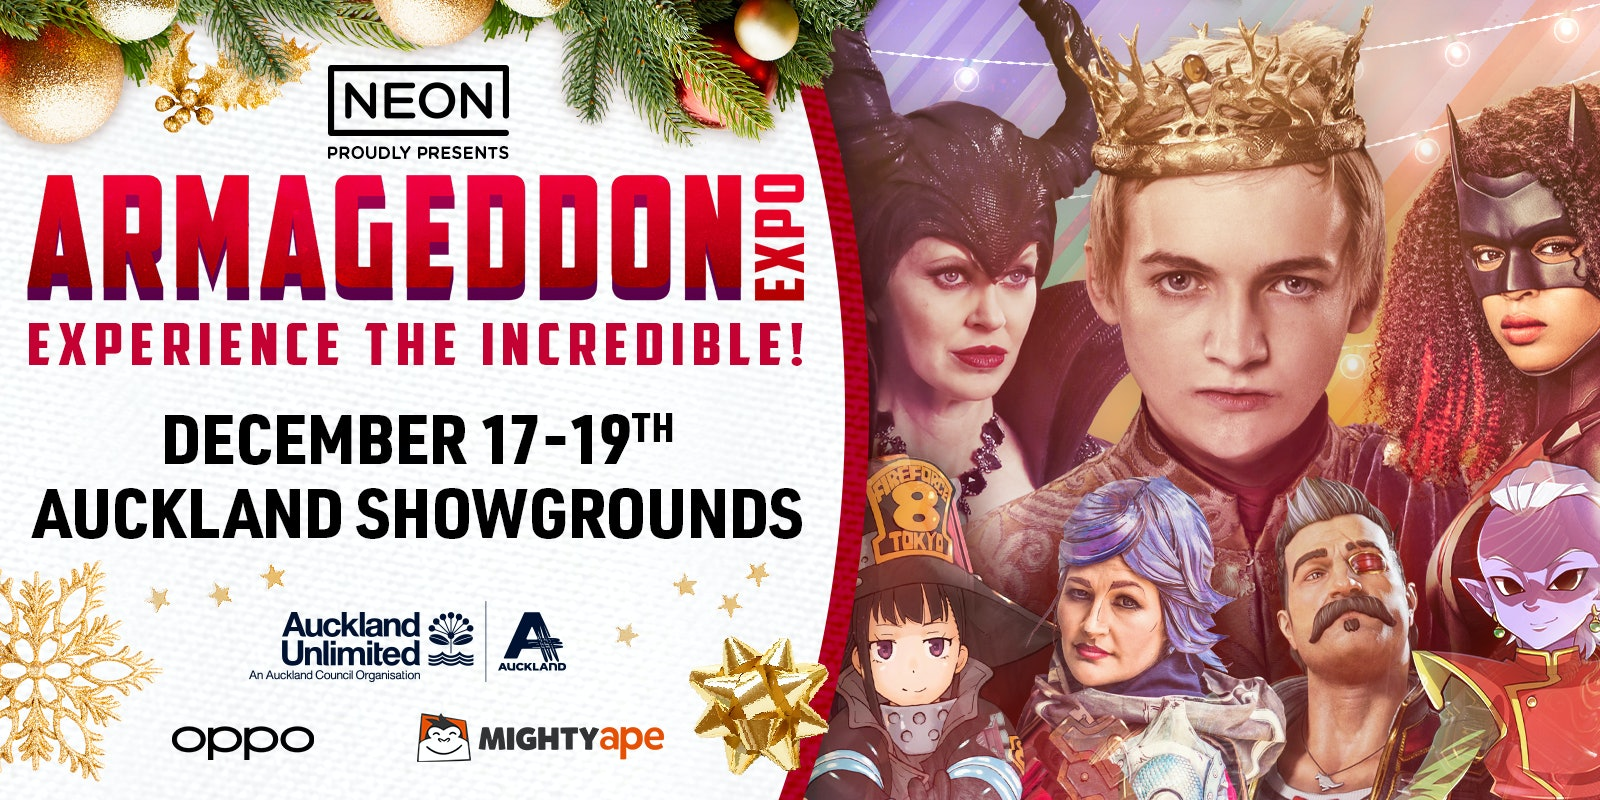 Armageddon Expo 2021 - Virtual Celebrity Signings